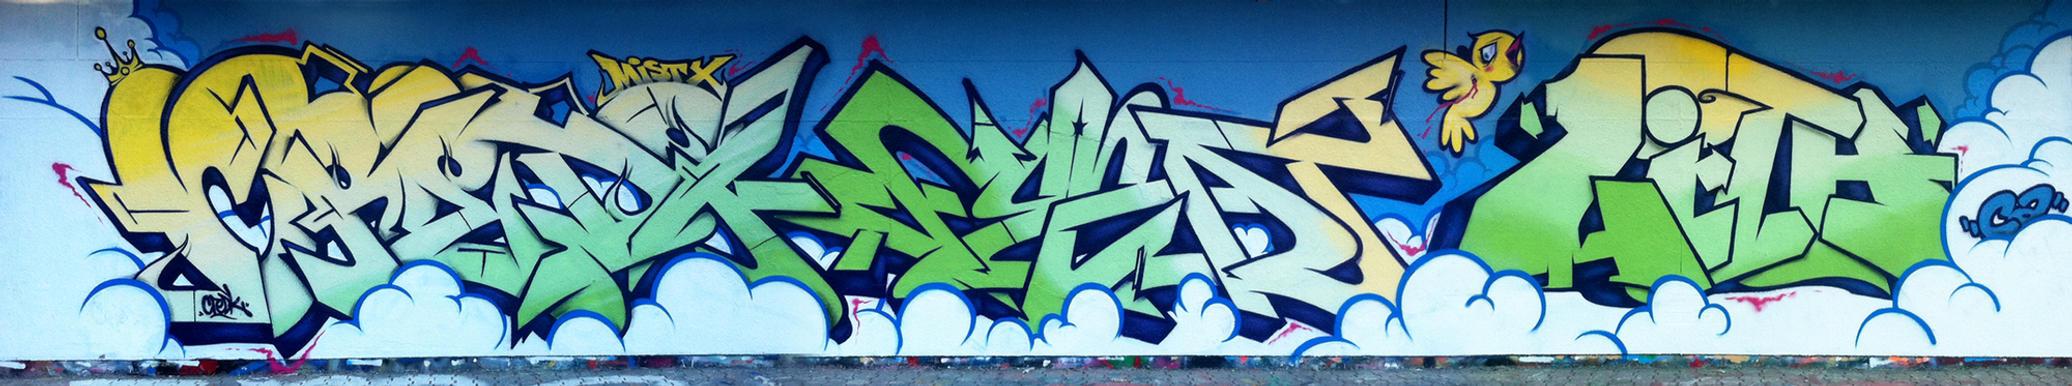 CA. Sky High by Fezat1